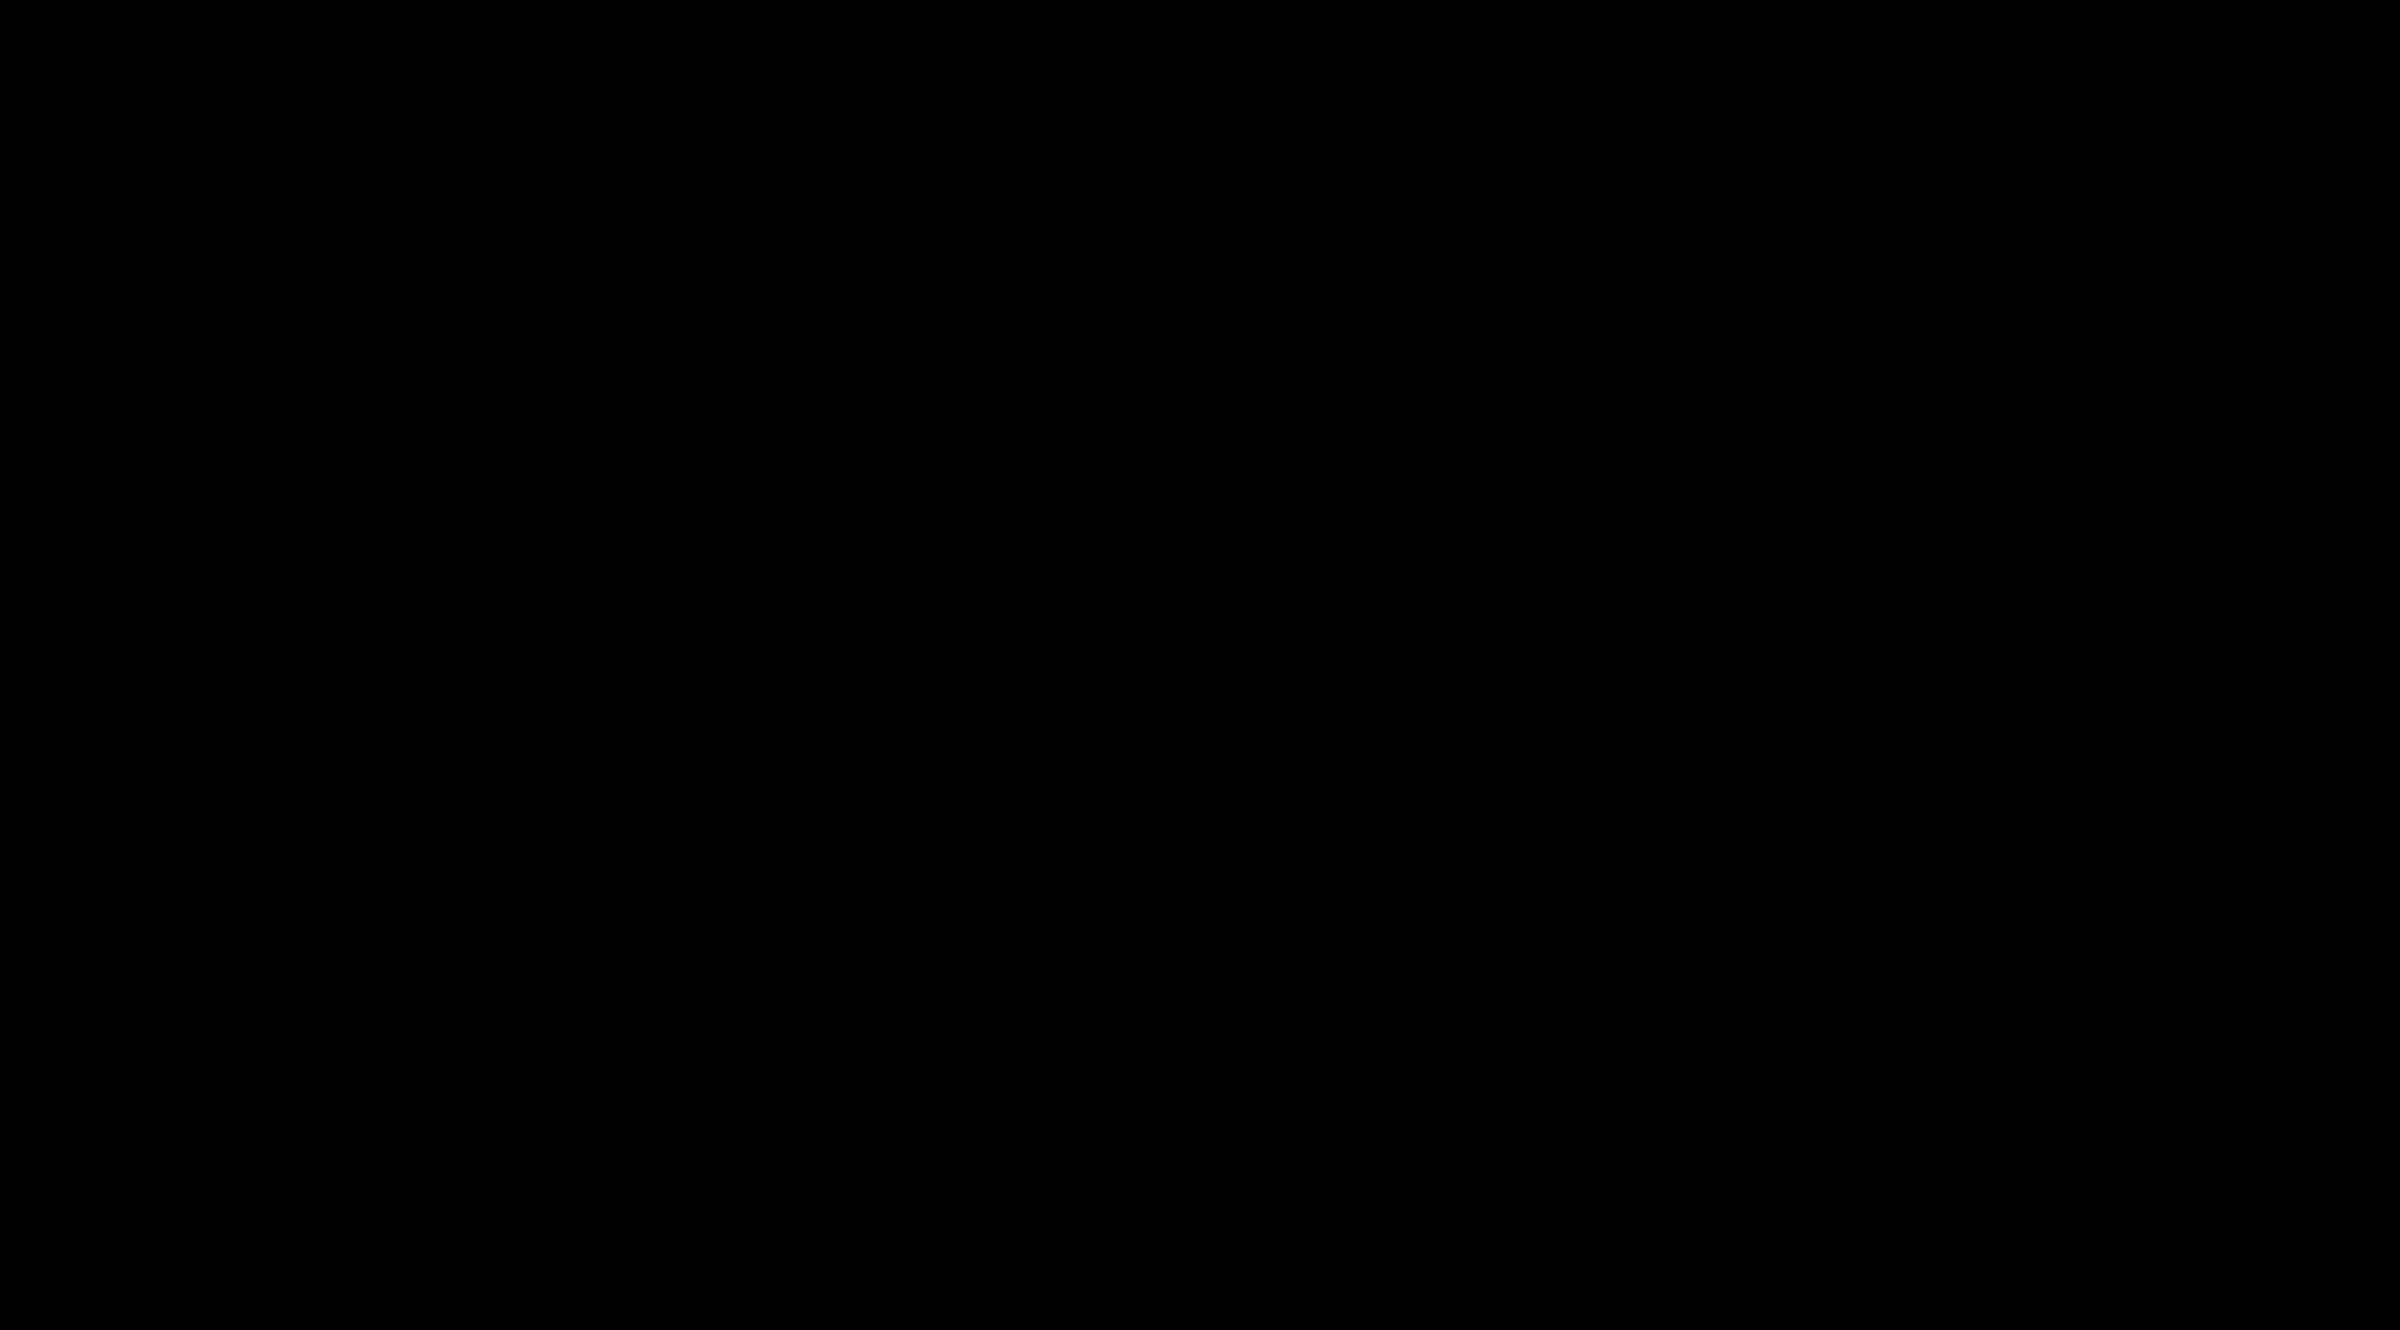 2400x1330 Silhouette